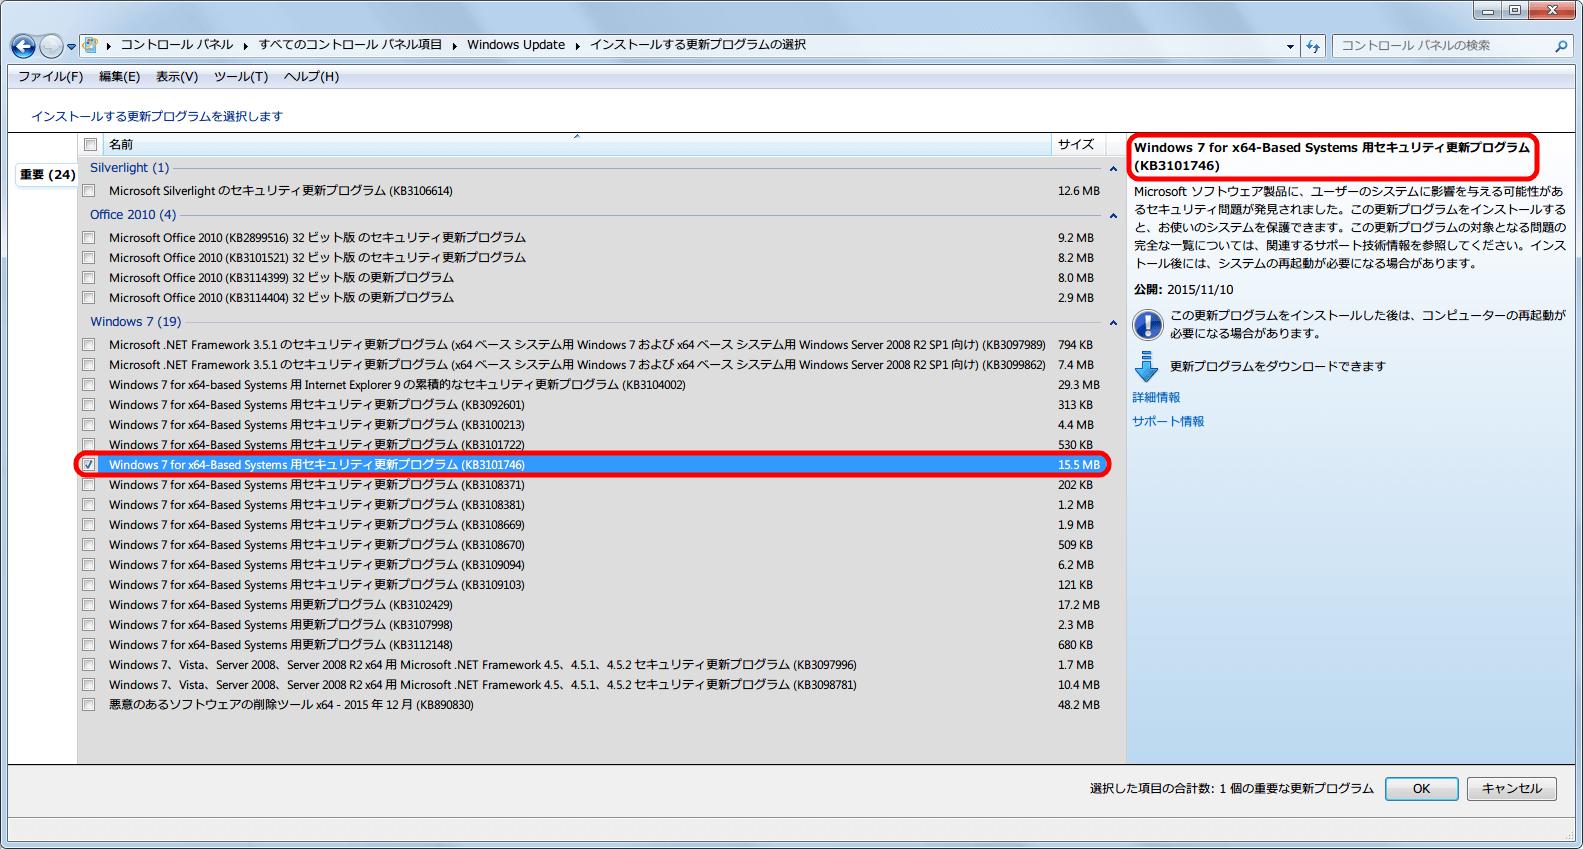 Windows Update 2015年11月分 3番目 KB3101746 インストール後、再起動